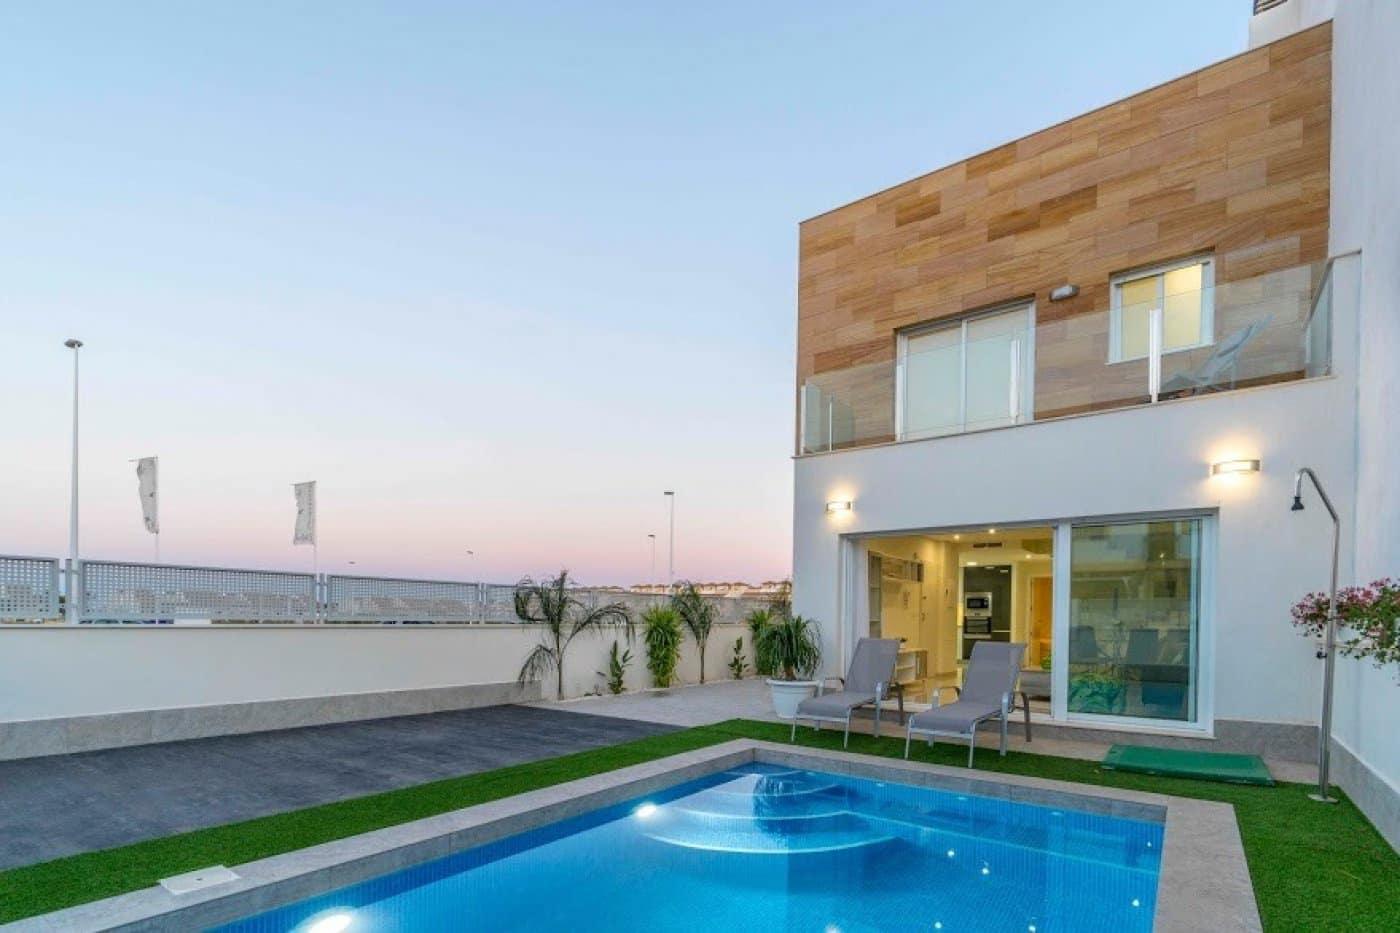 3 bedroom Terraced Villa for sale in San Pedro del Pinatar with pool - € 220,000 (Ref: 3967150)